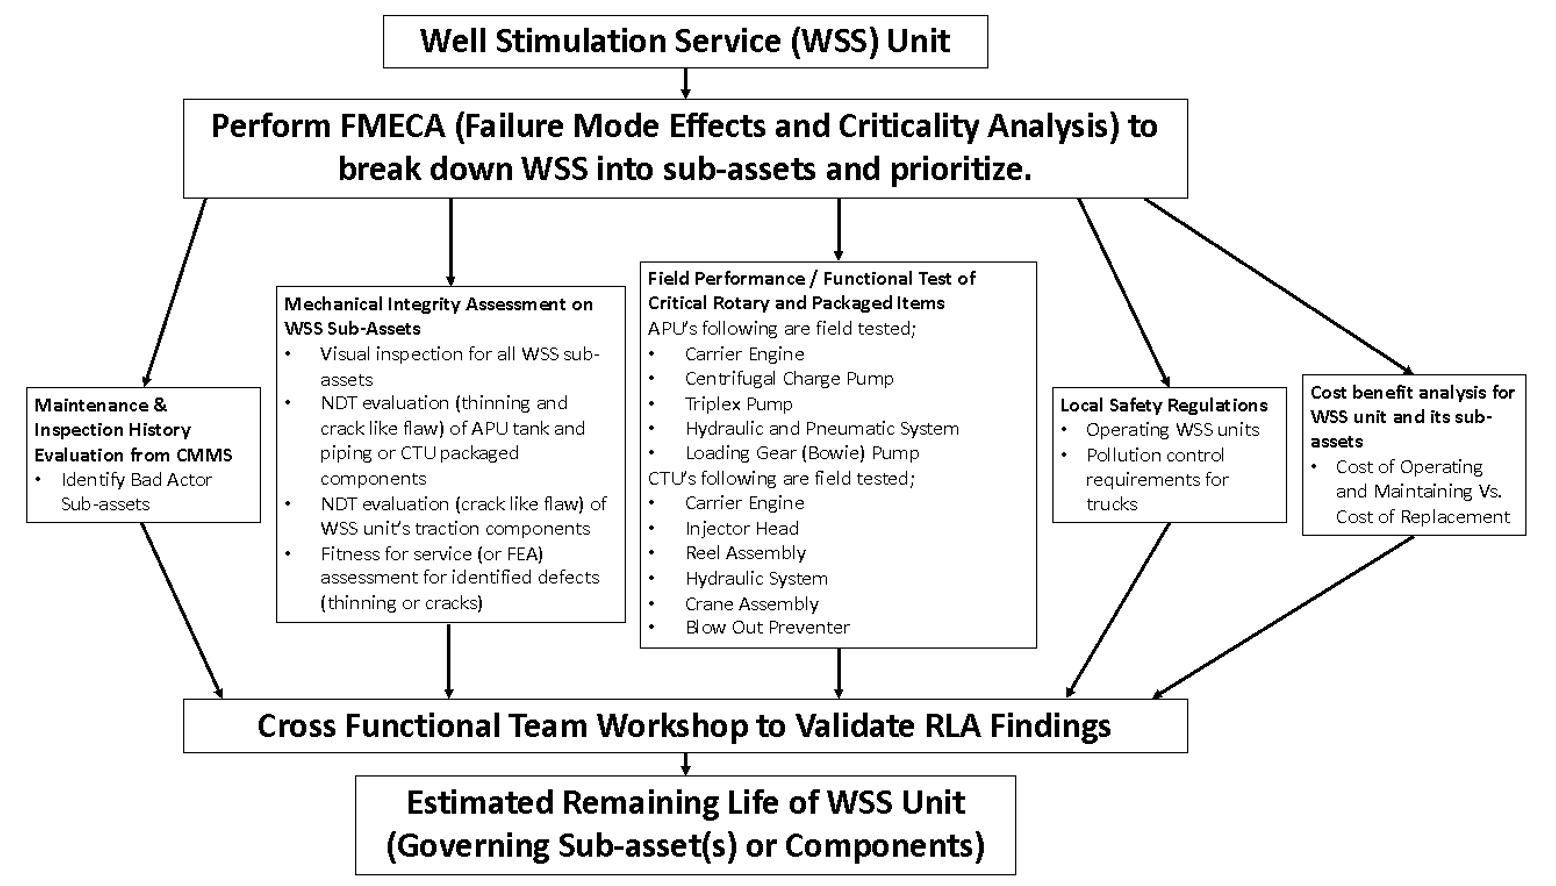 Figure 3. Flow Chart depicting Generic Remaining Life Assessment (RLA) Methodology for WSS Unit.